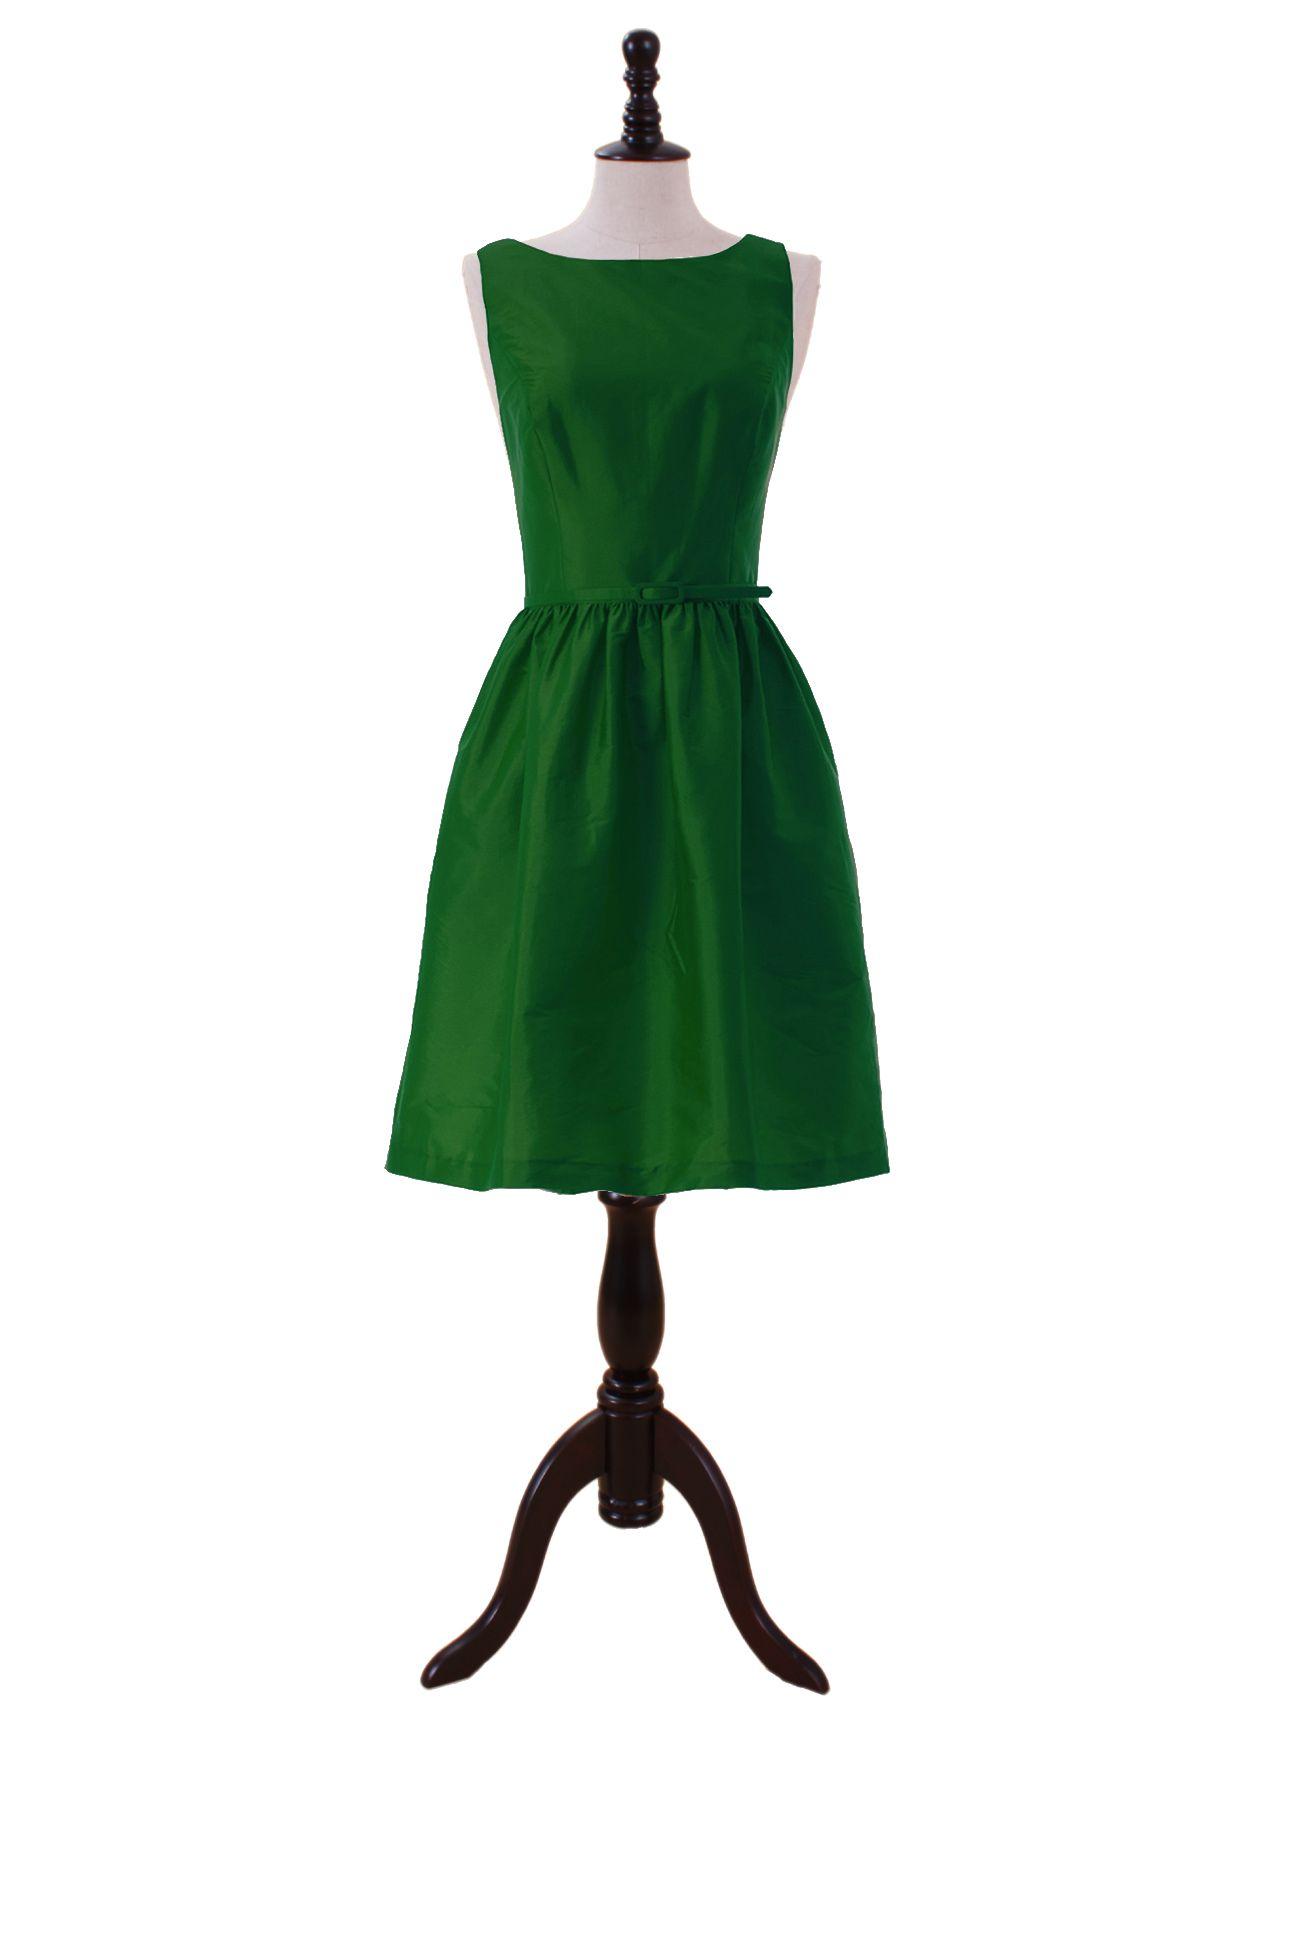 Taffeta bateau dress with skinny belt and full skirt clothes